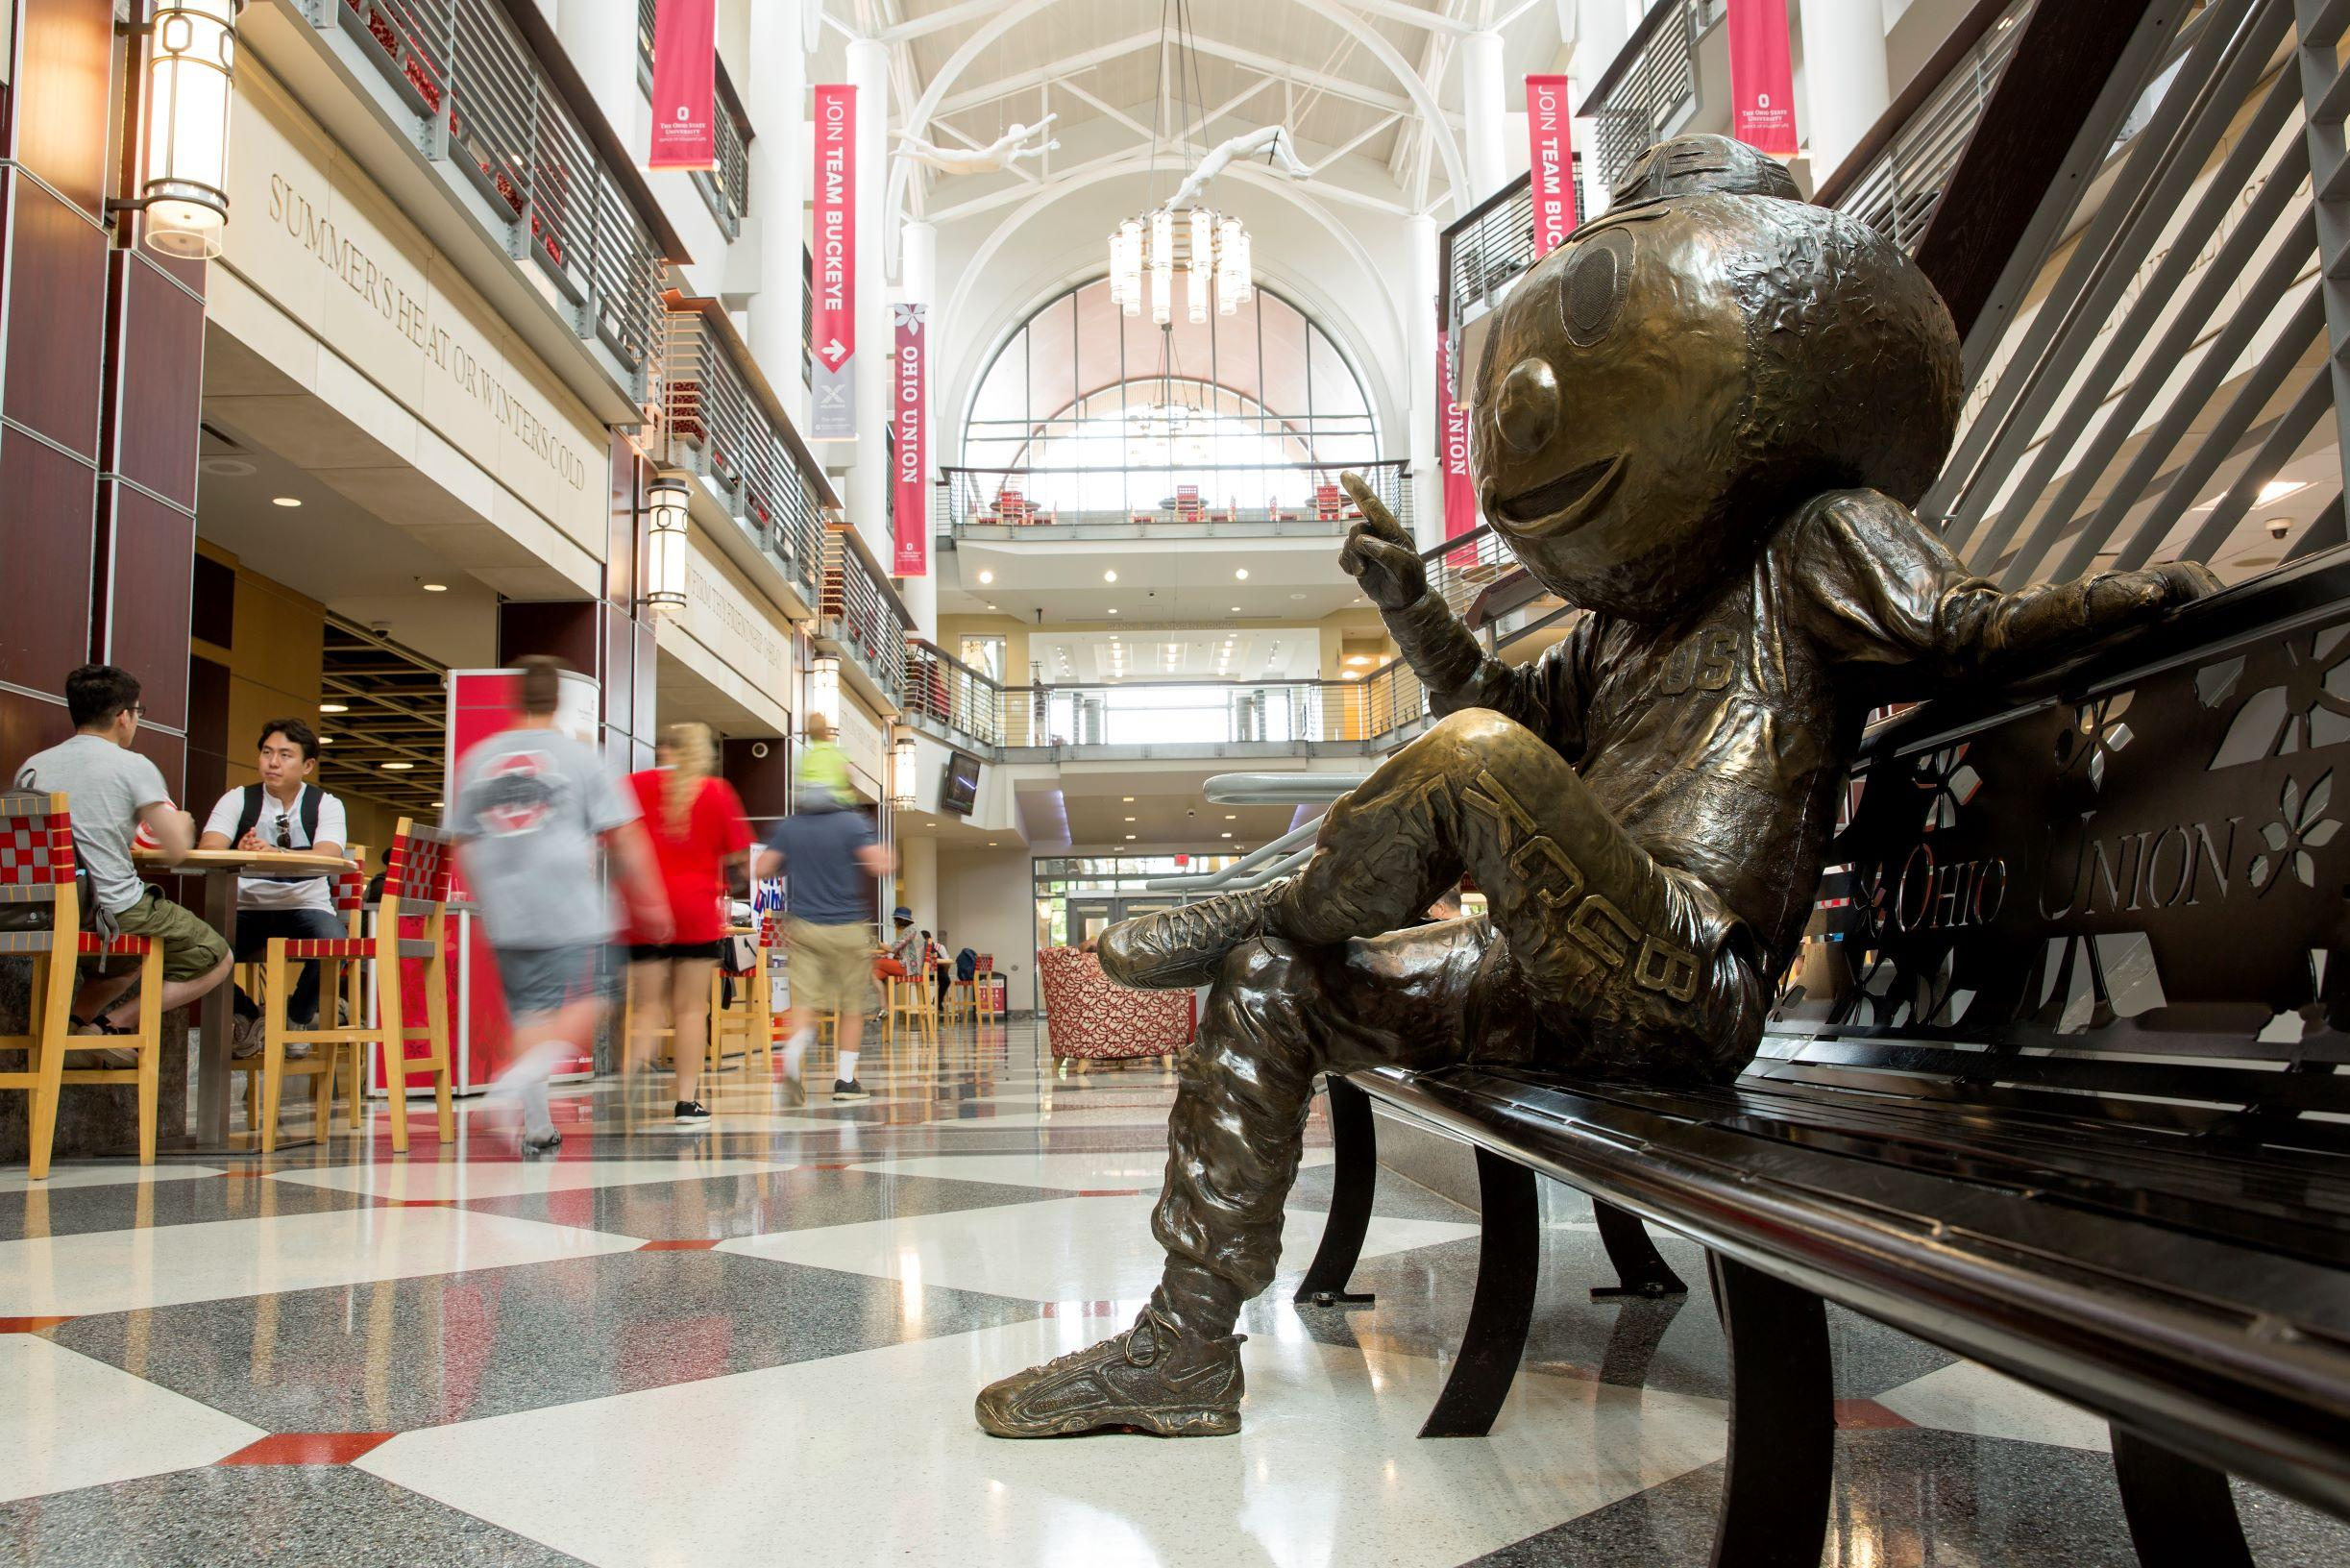 Brutus Buckeye statue in the Ohio Union